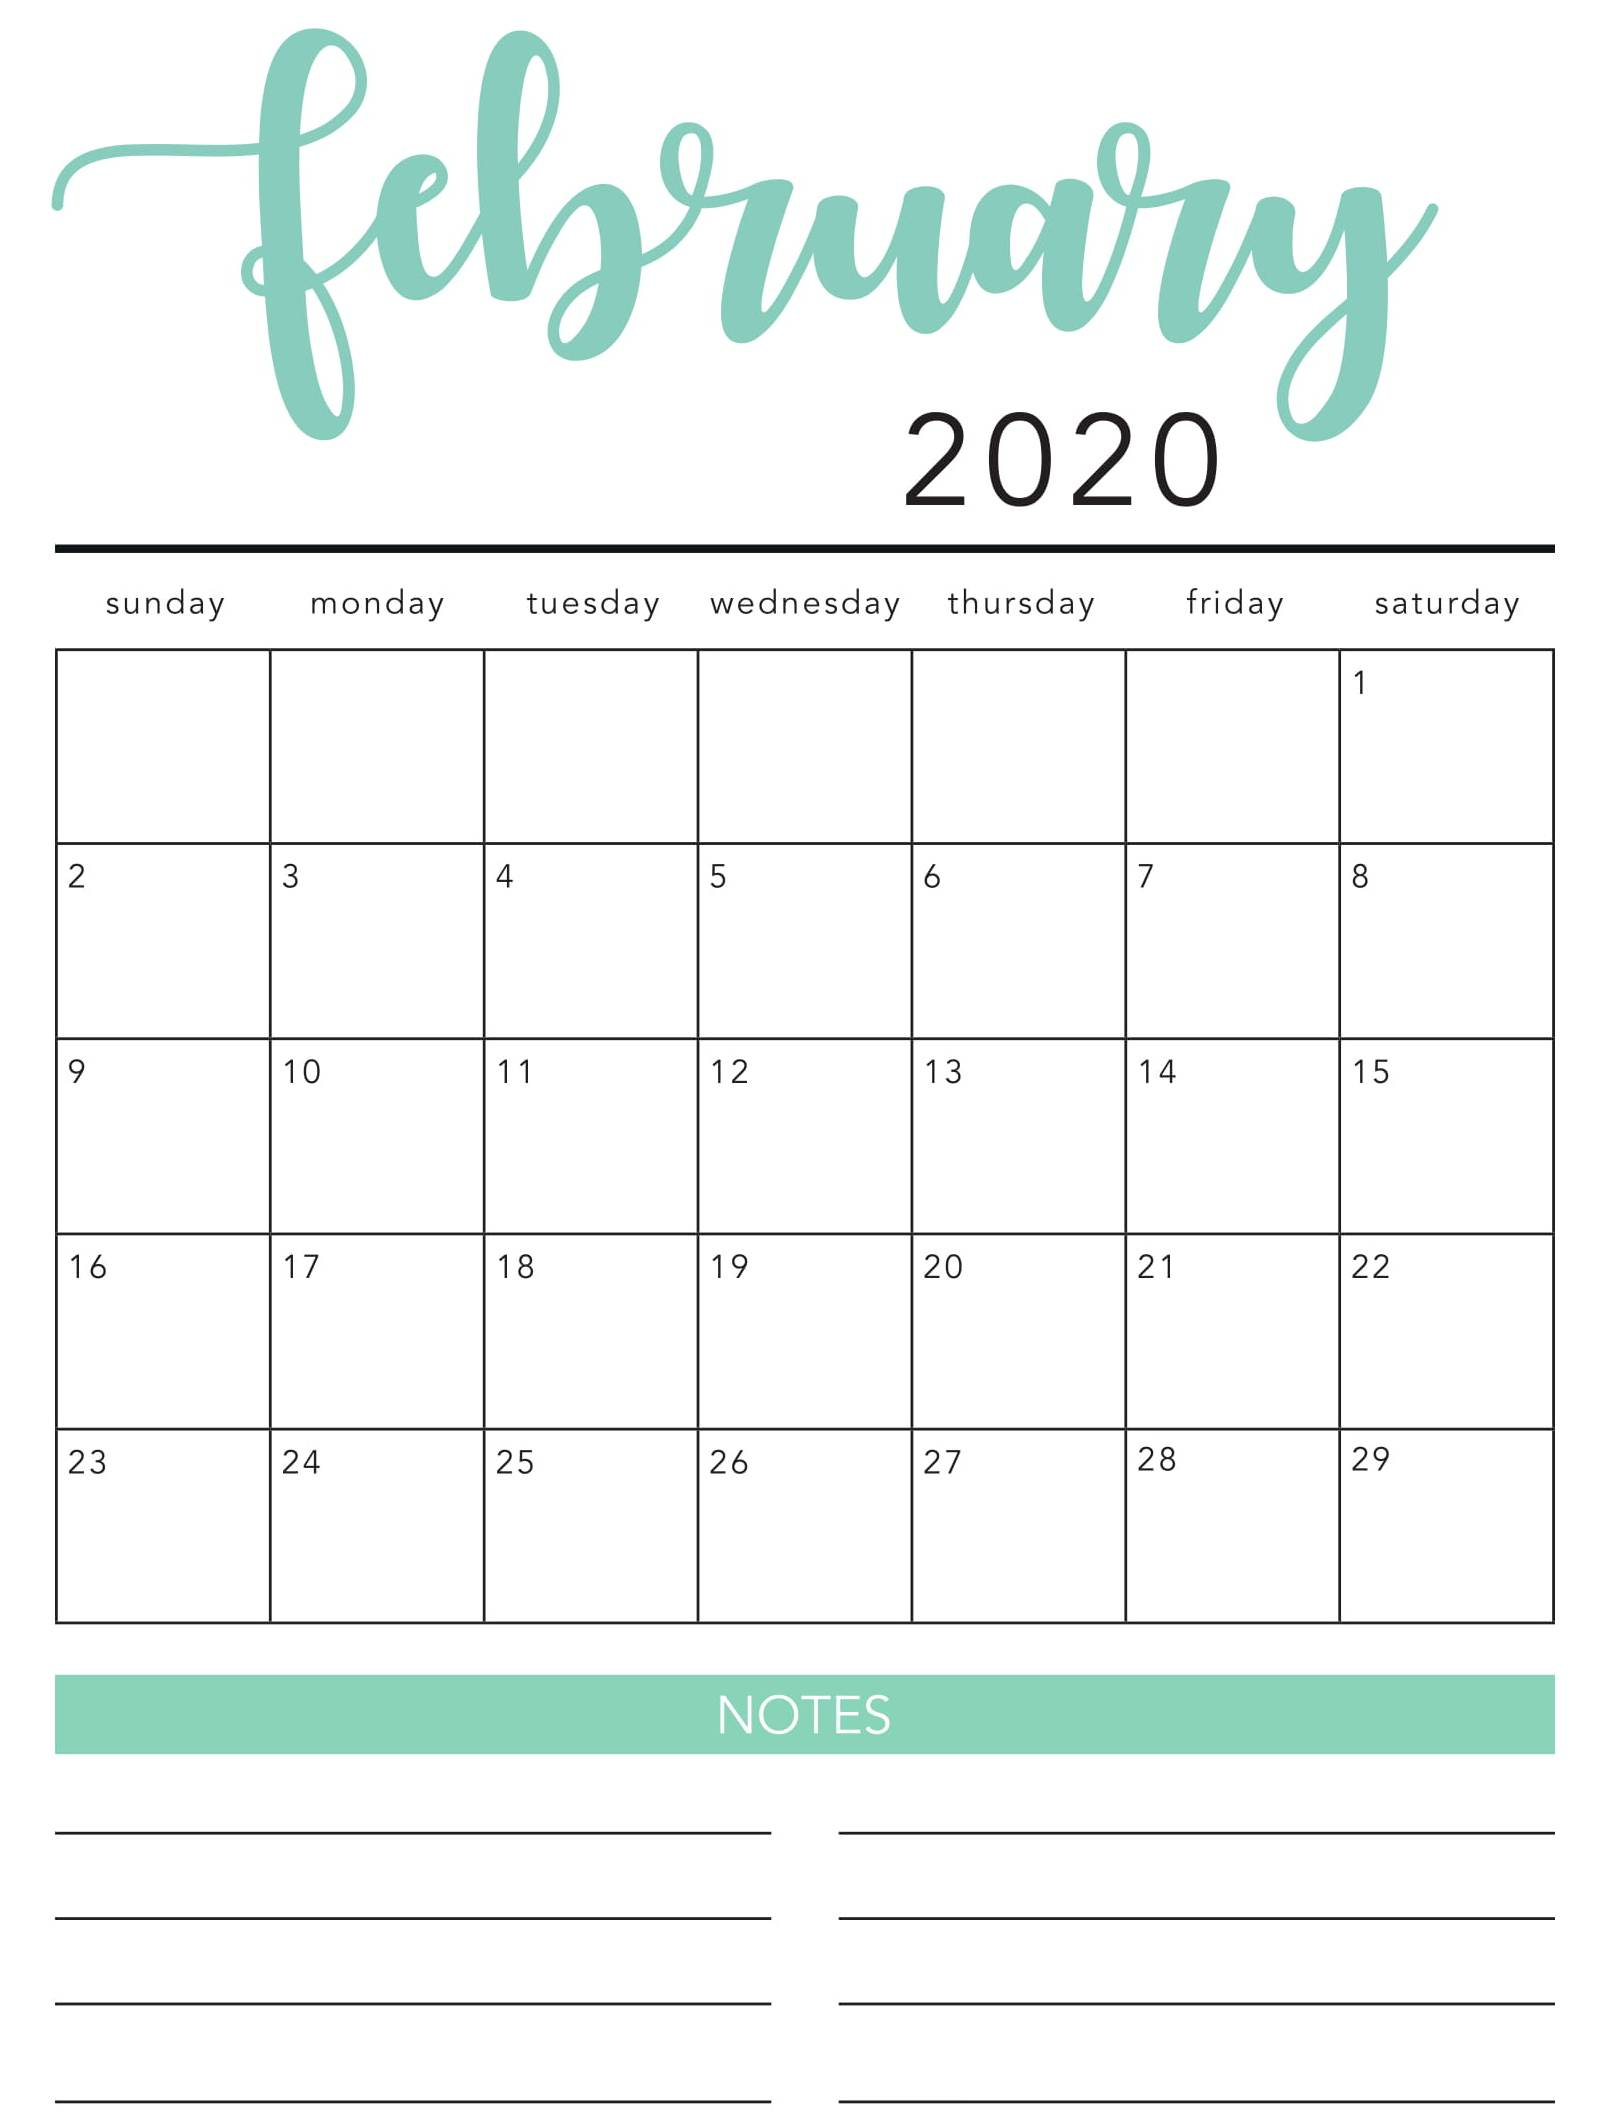 Feb 2020 Wall Calendar